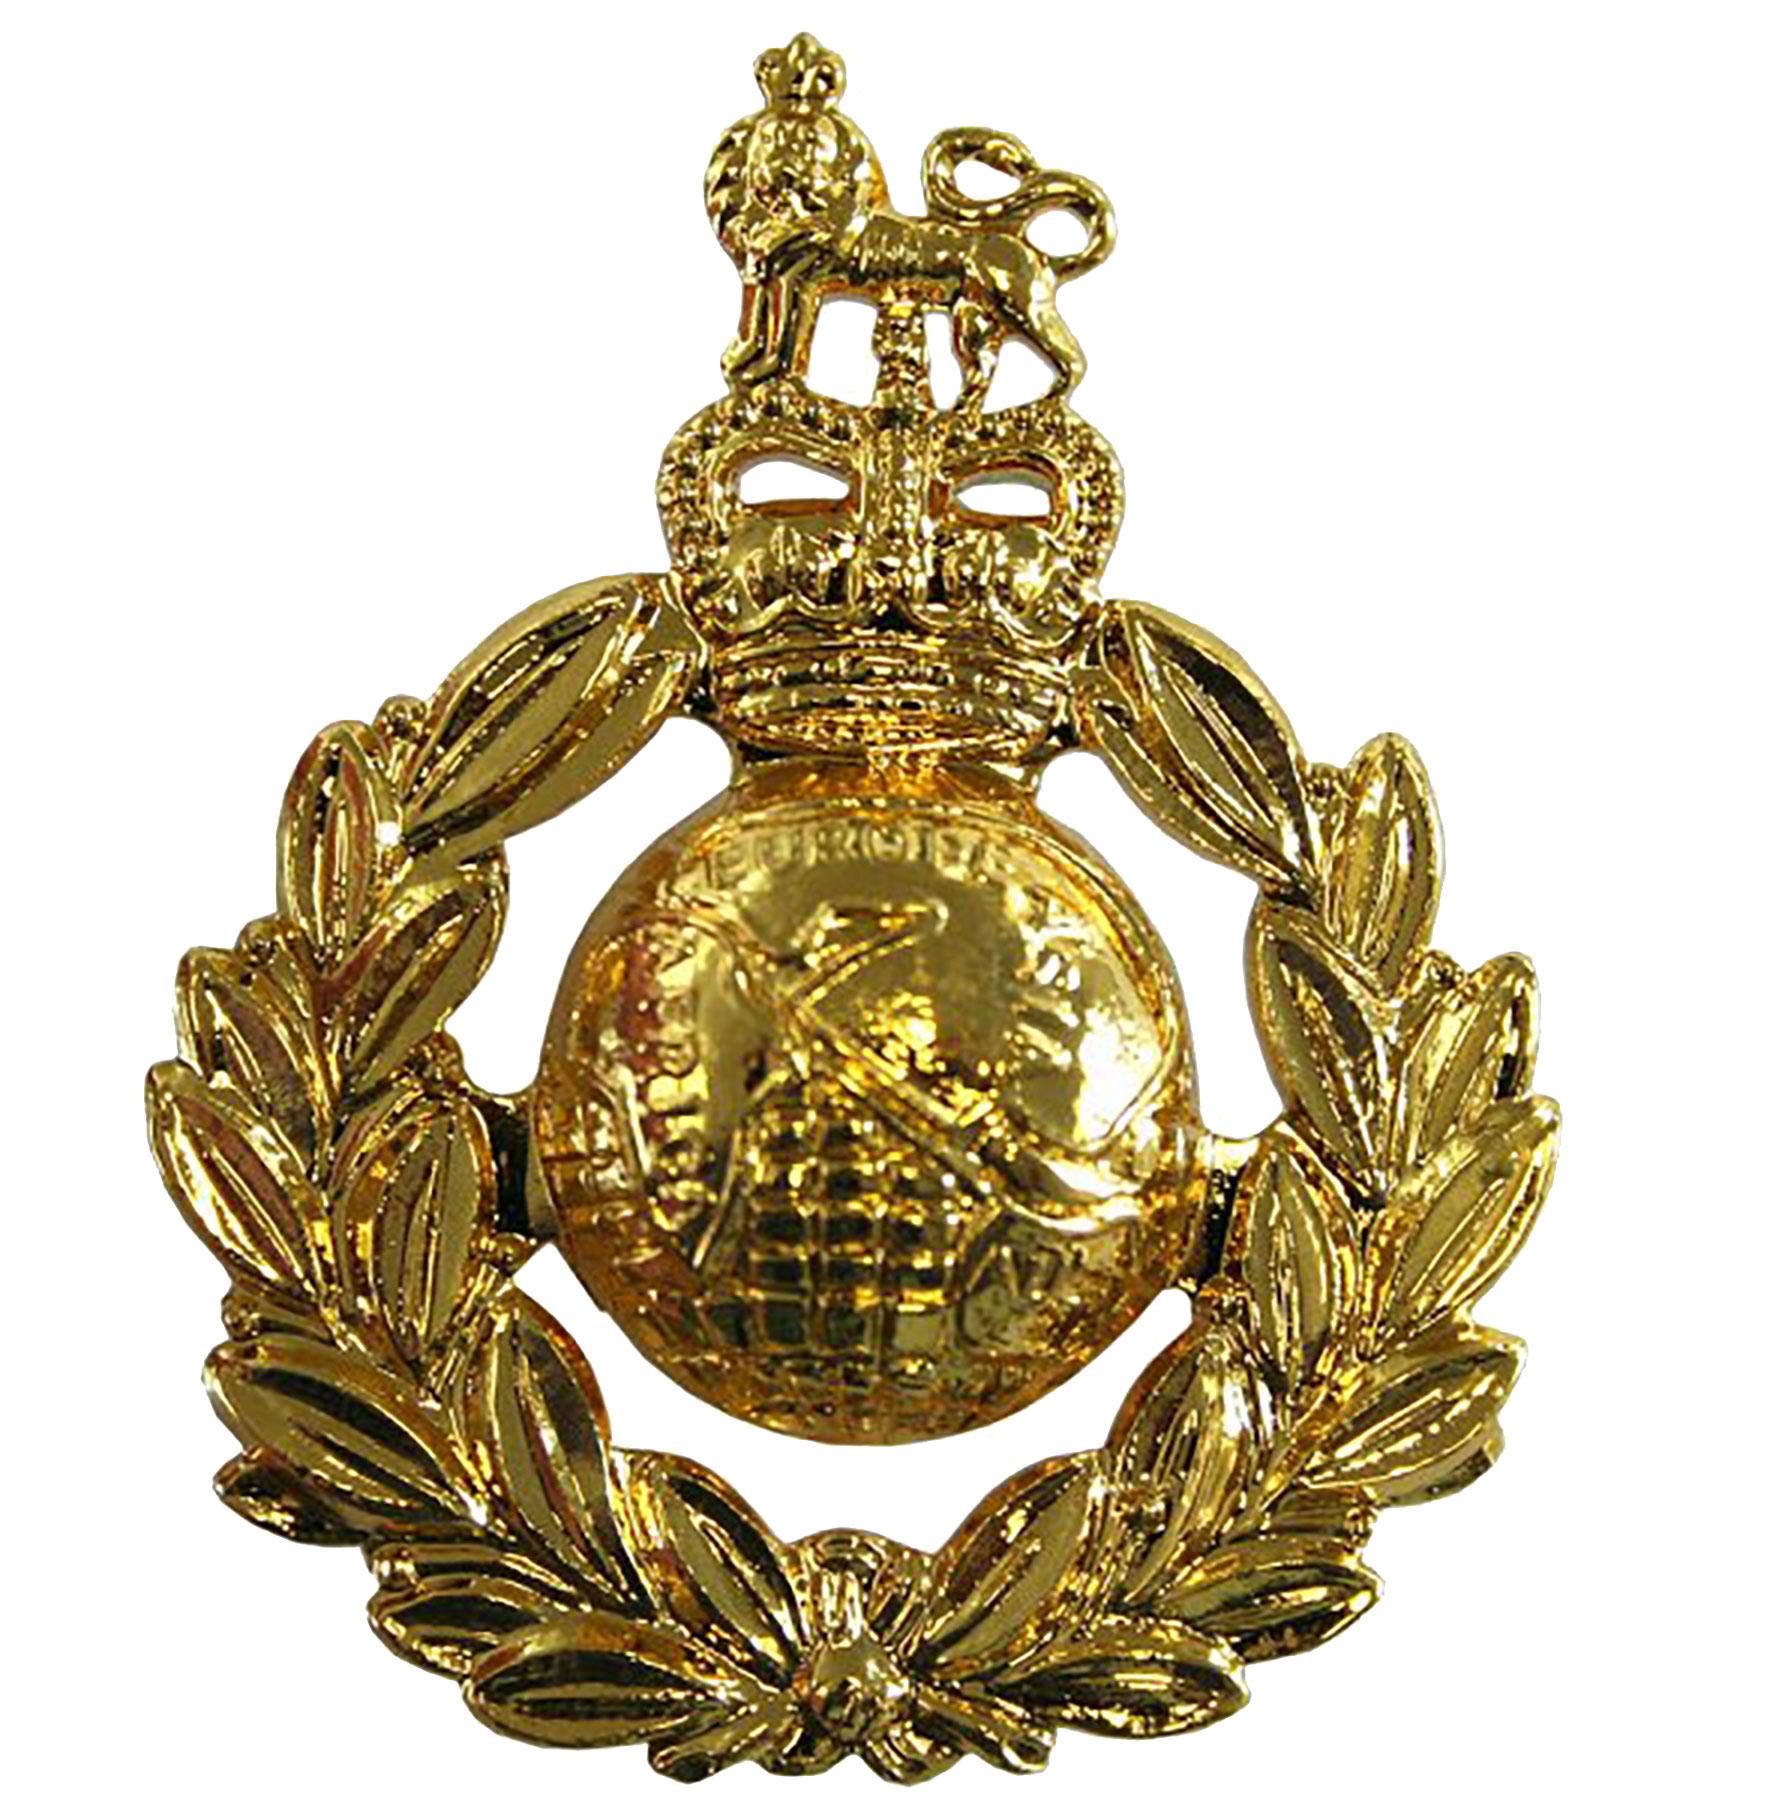 MILITARY CAP BADGES - UK Forces Direct 142de6329eaa